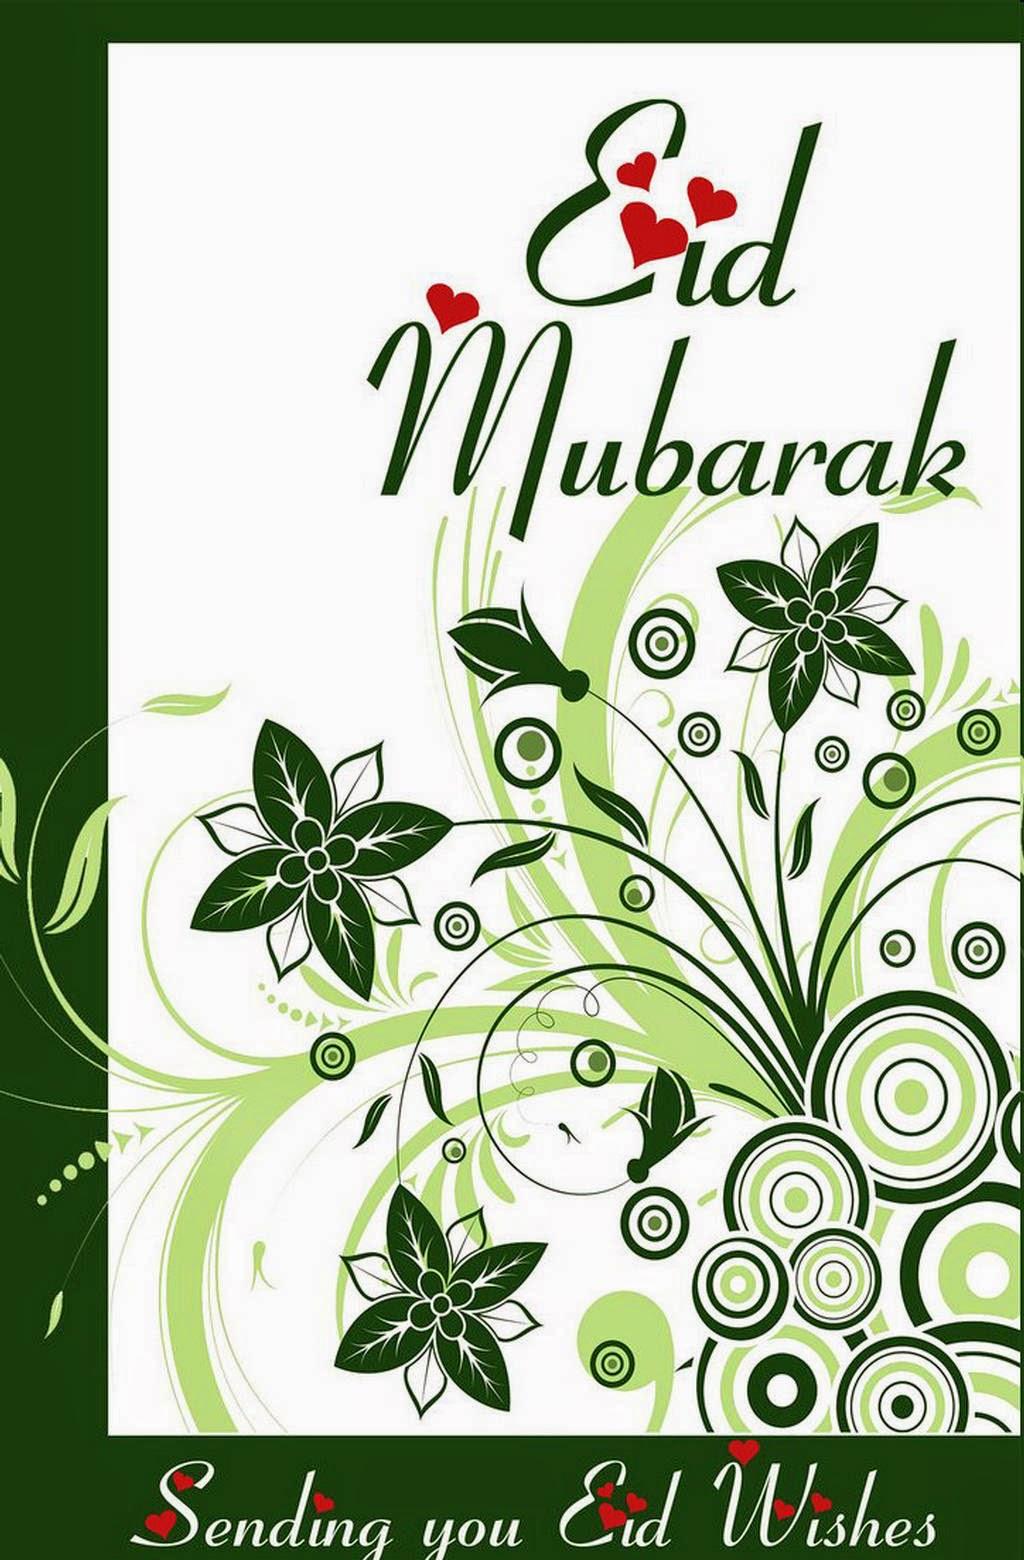 Eid mubarak wallpapers bakra eid mubarak message wallpapers eid eid mubarak wallpapers kristyandbryce Choice Image